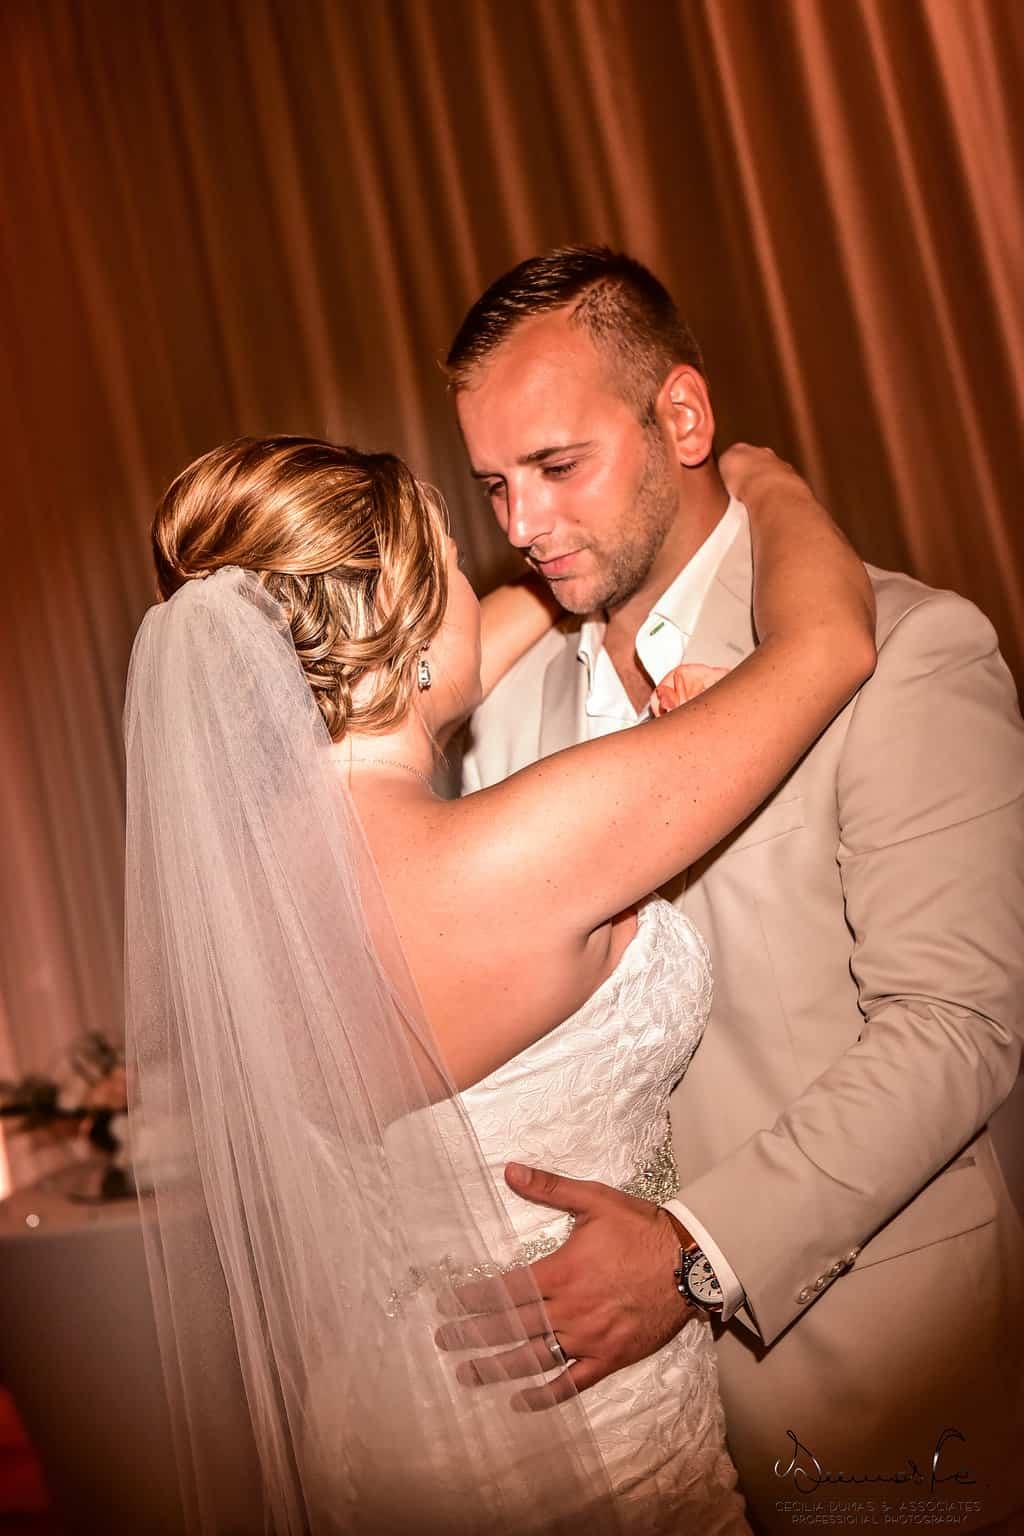 cancun-moonpalacehotel-weddingphotography100